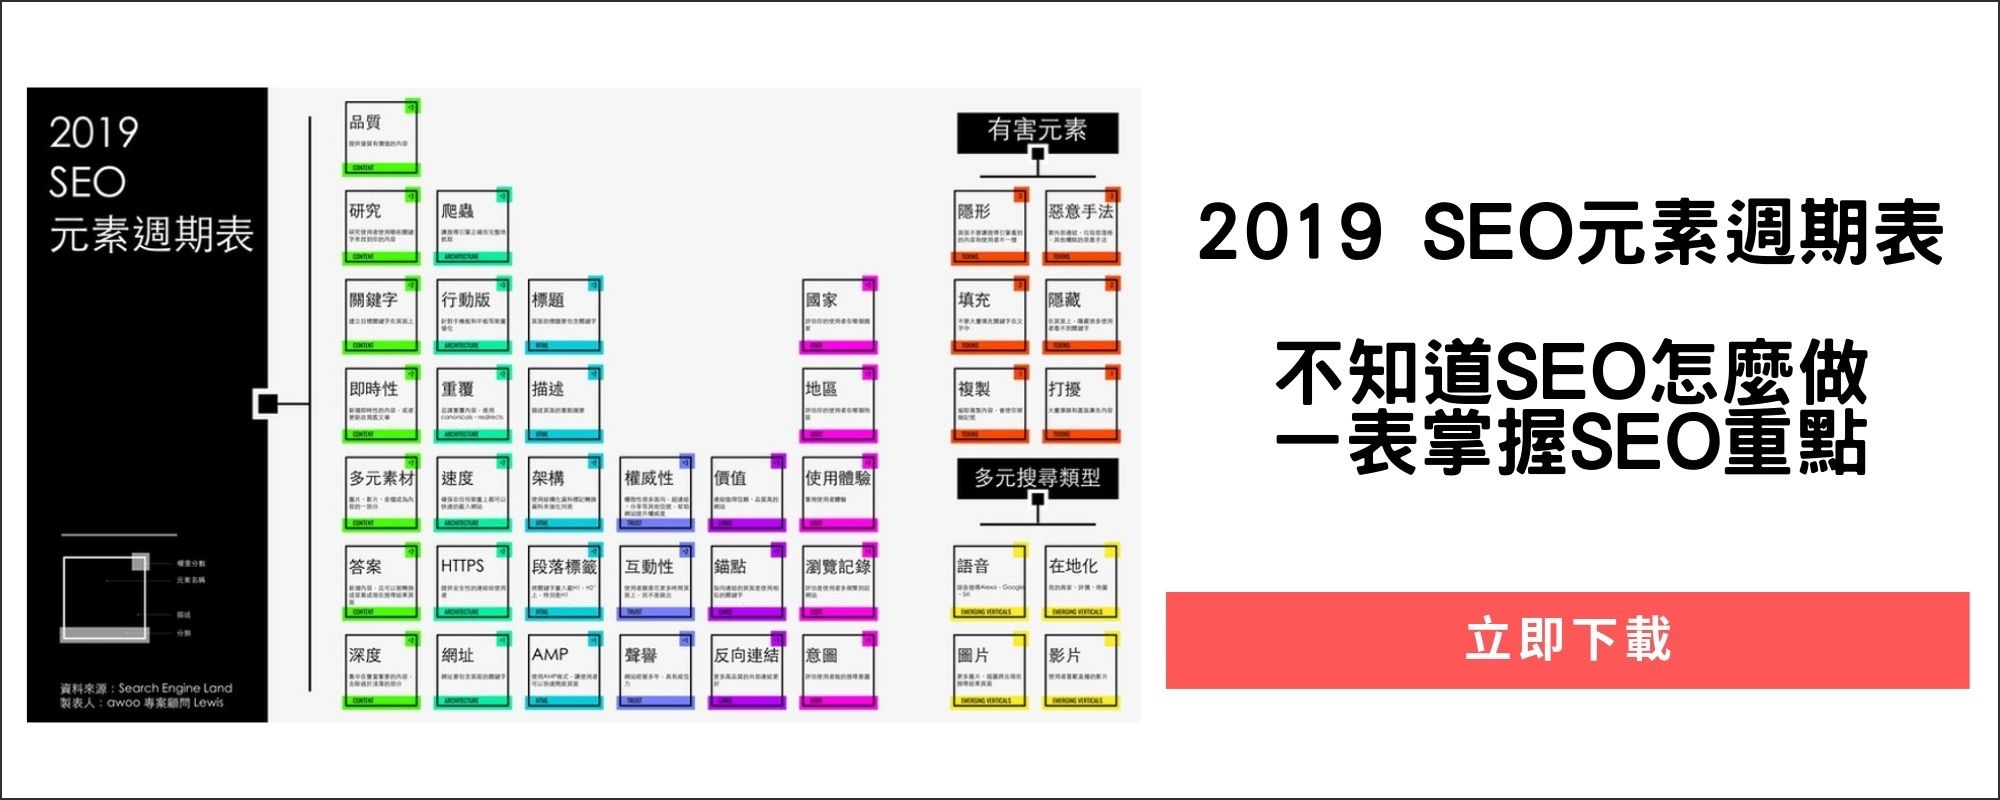 2019 SEO元素週期表 - CTA